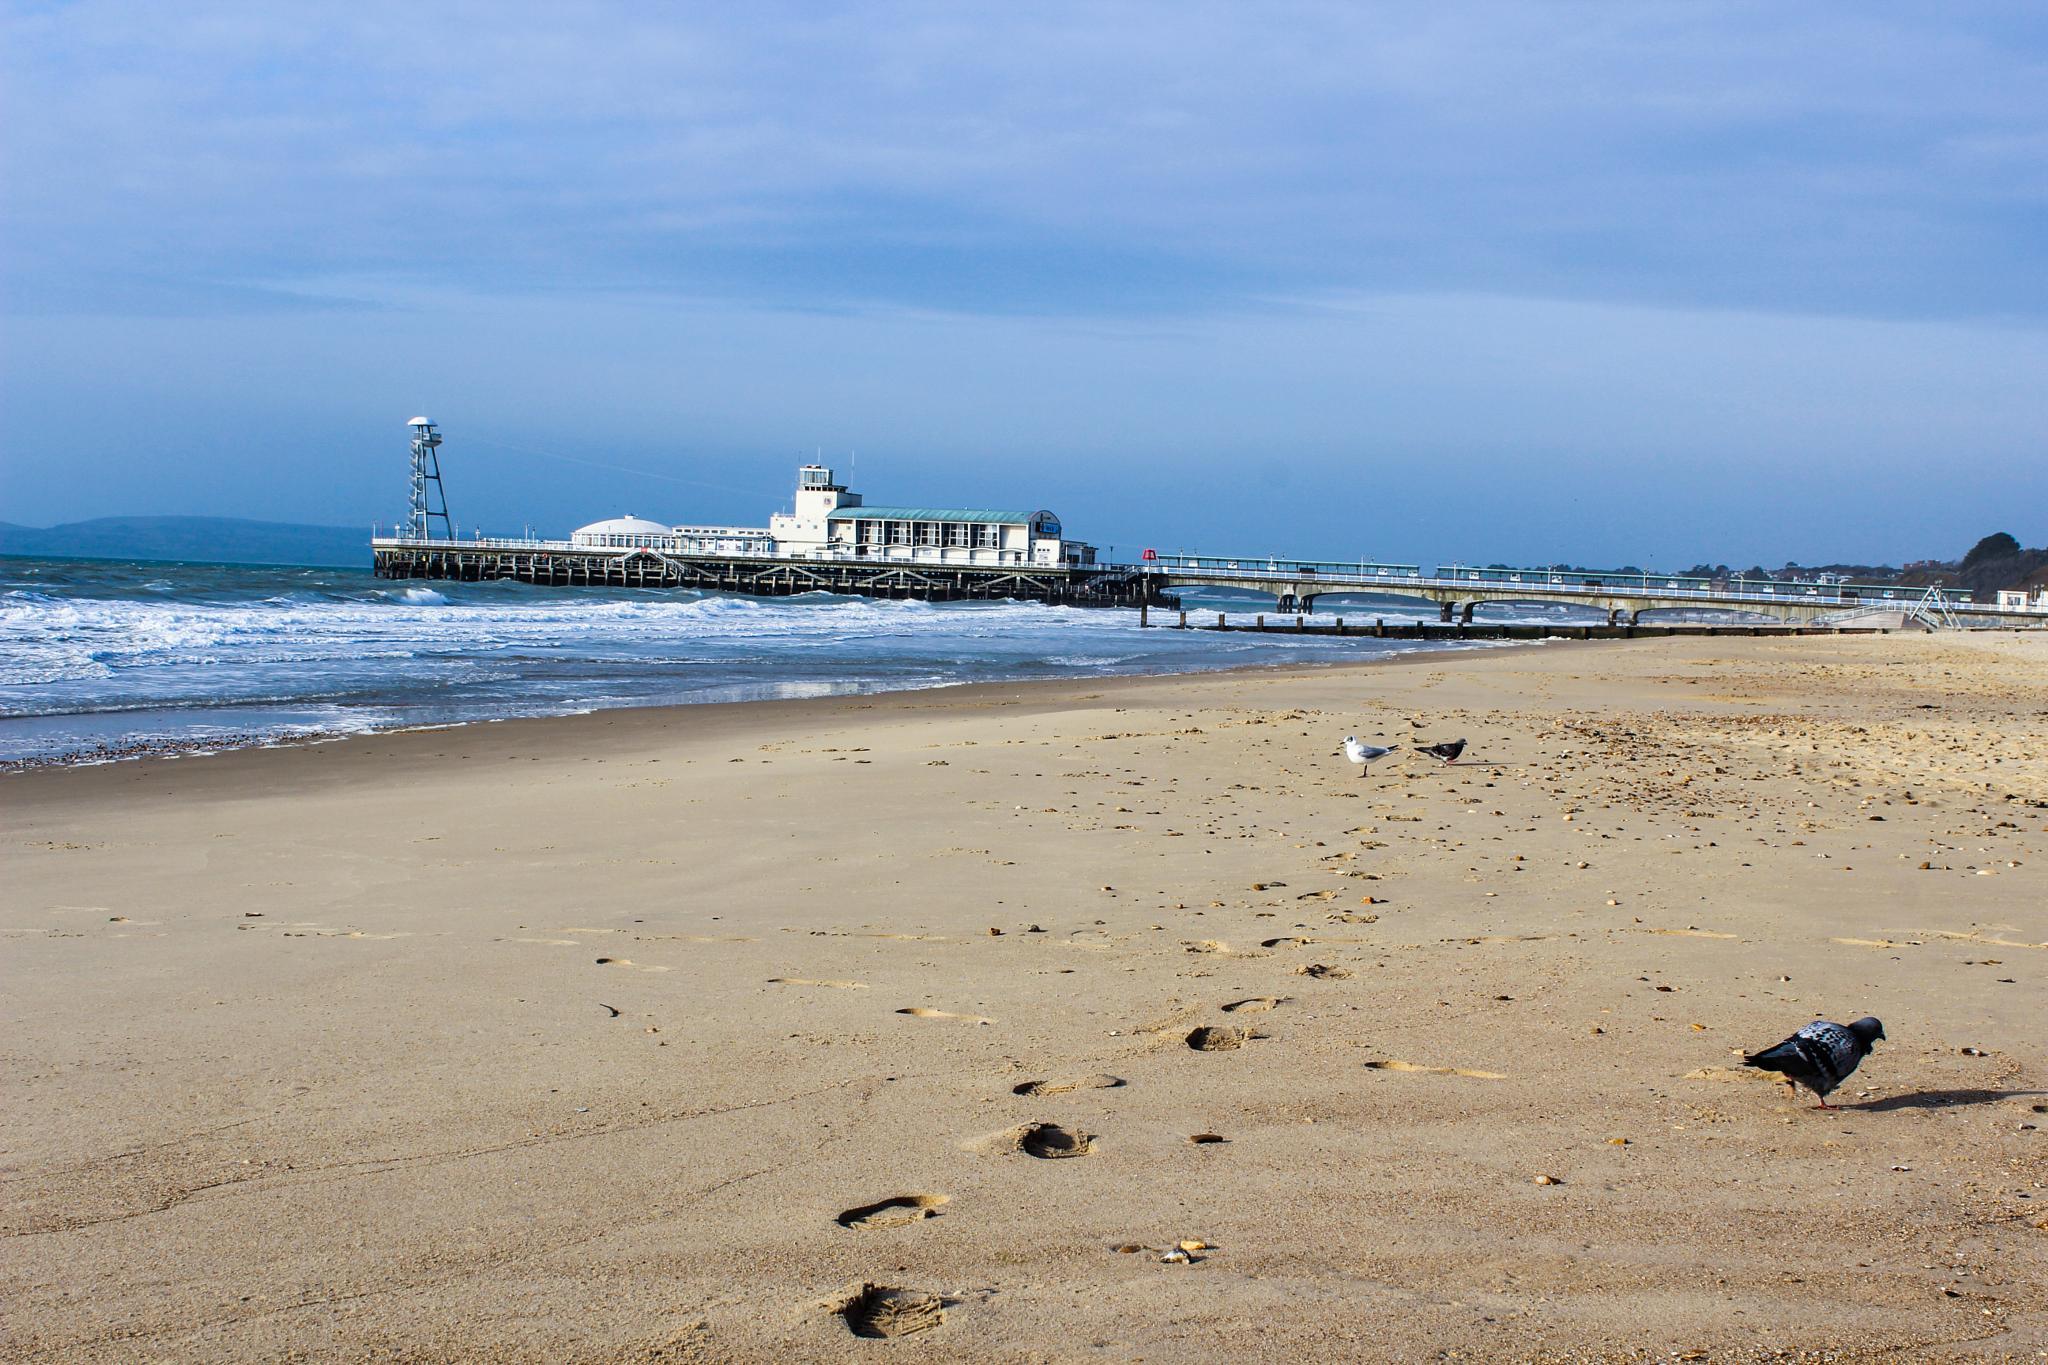 bournemouth pier by peakman